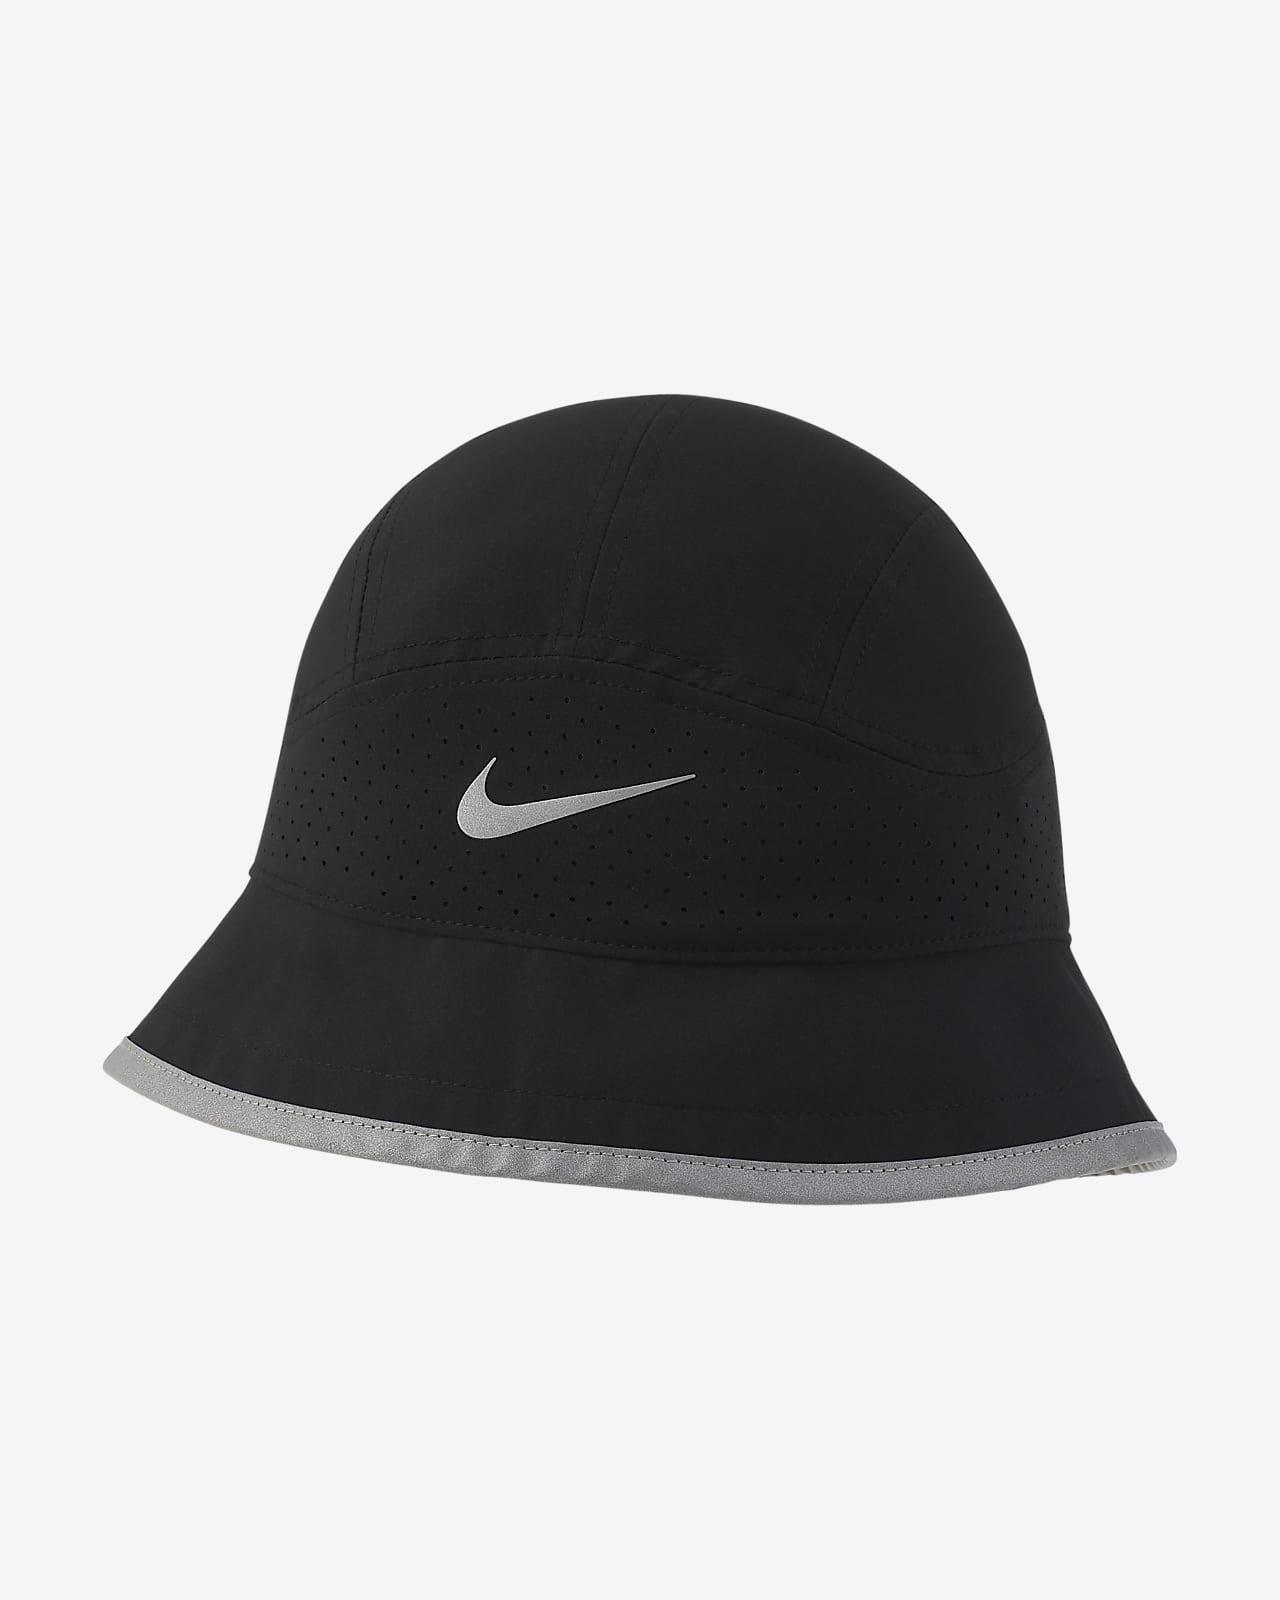 Bob de running perforé Nike Dri-FIT